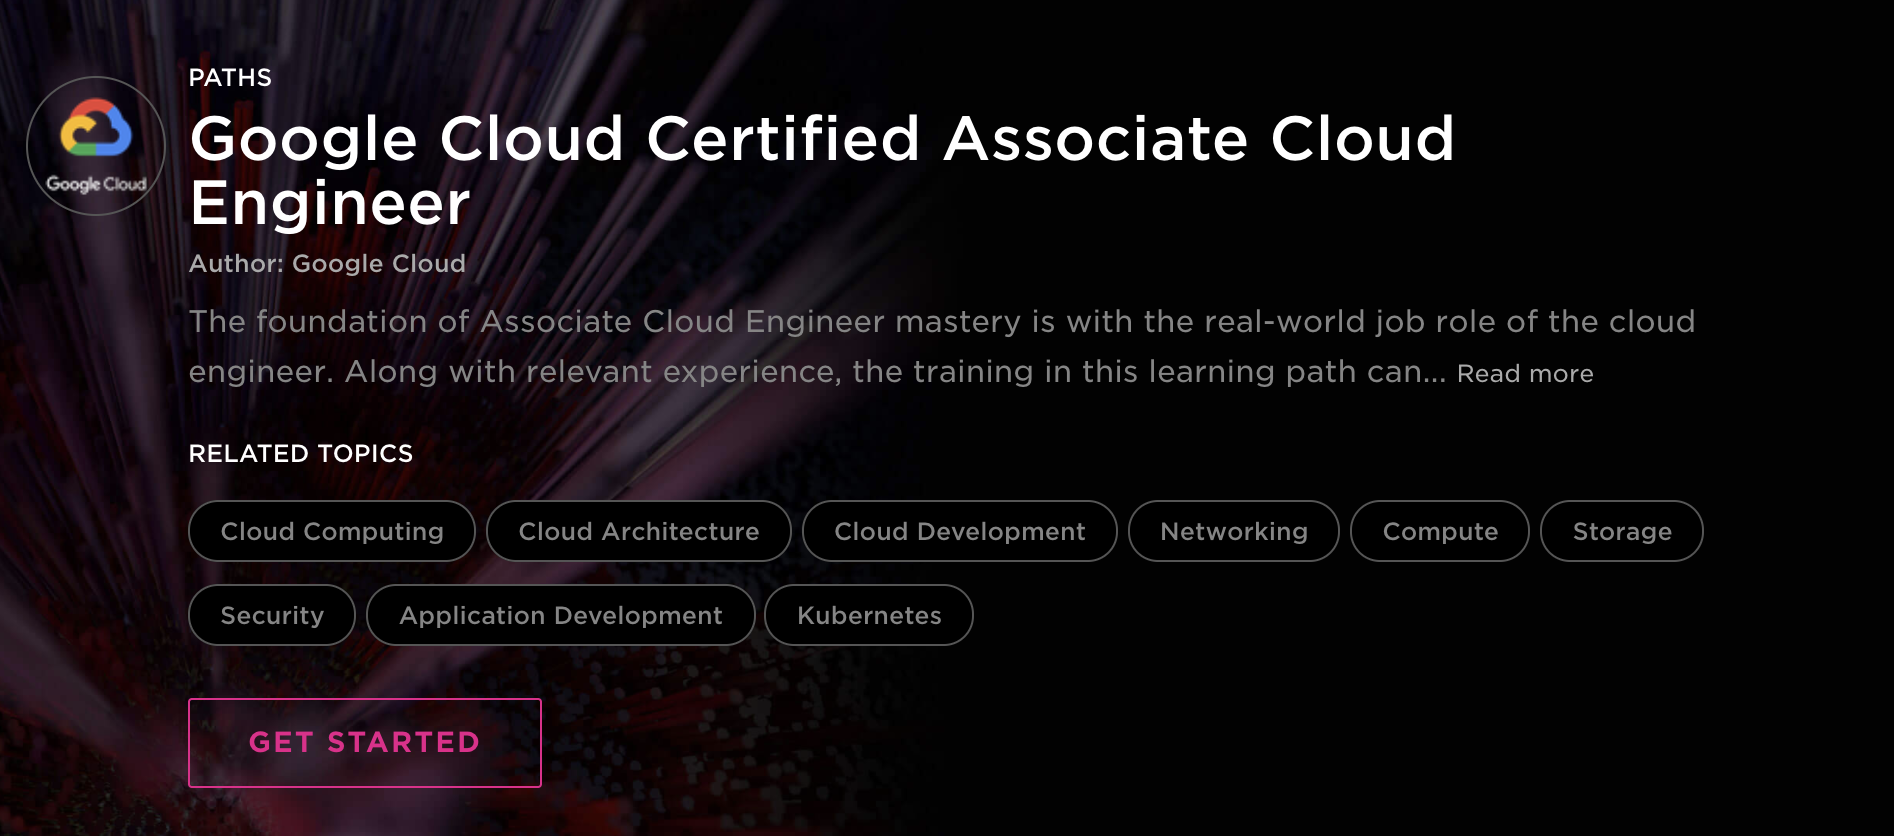 Google Cloud Certified Associate Cloud Engineer learning path